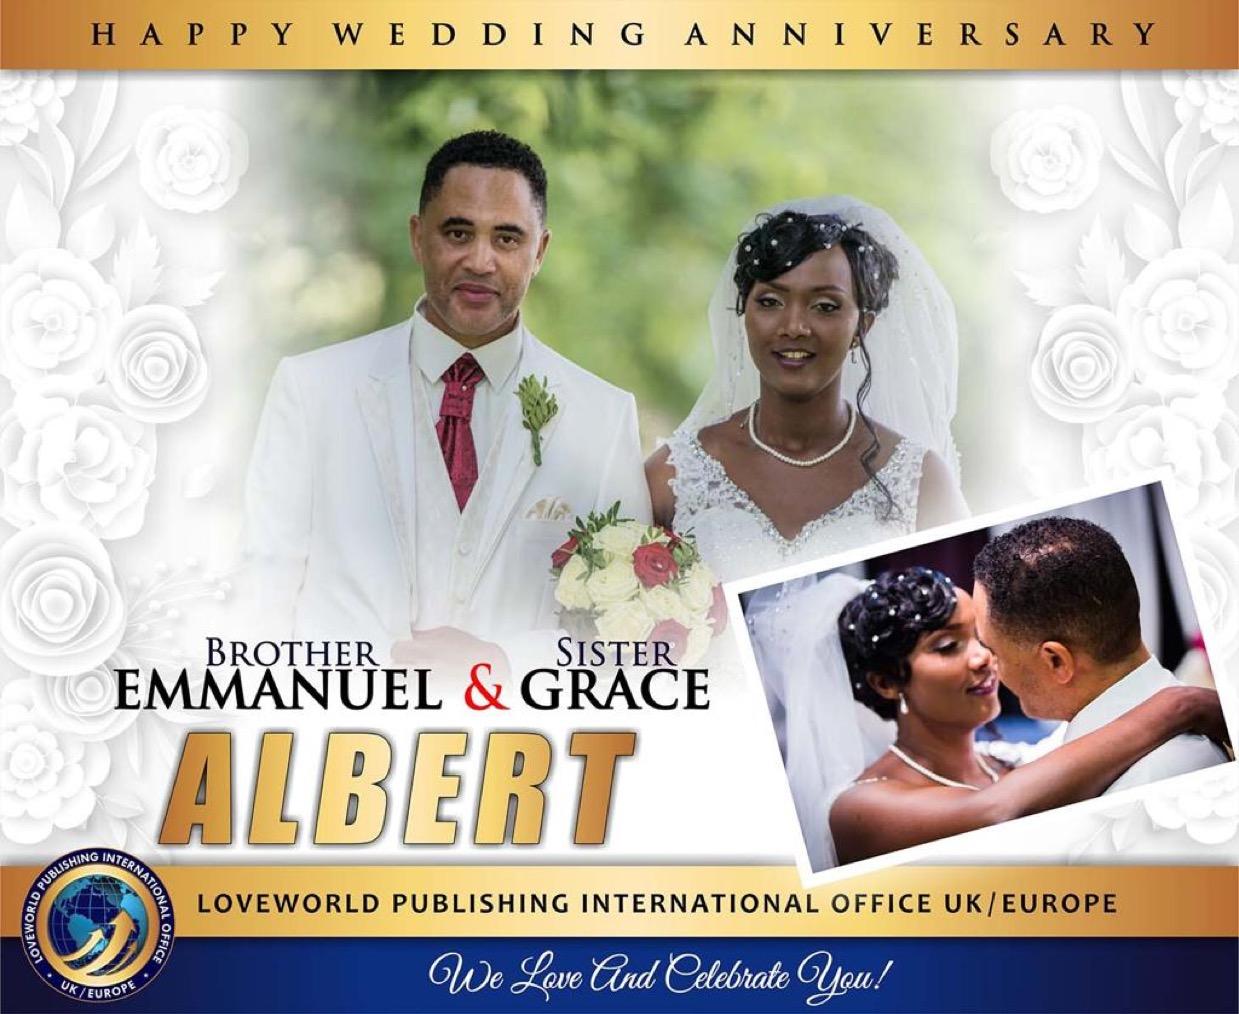 Happy wedding anniversary to you